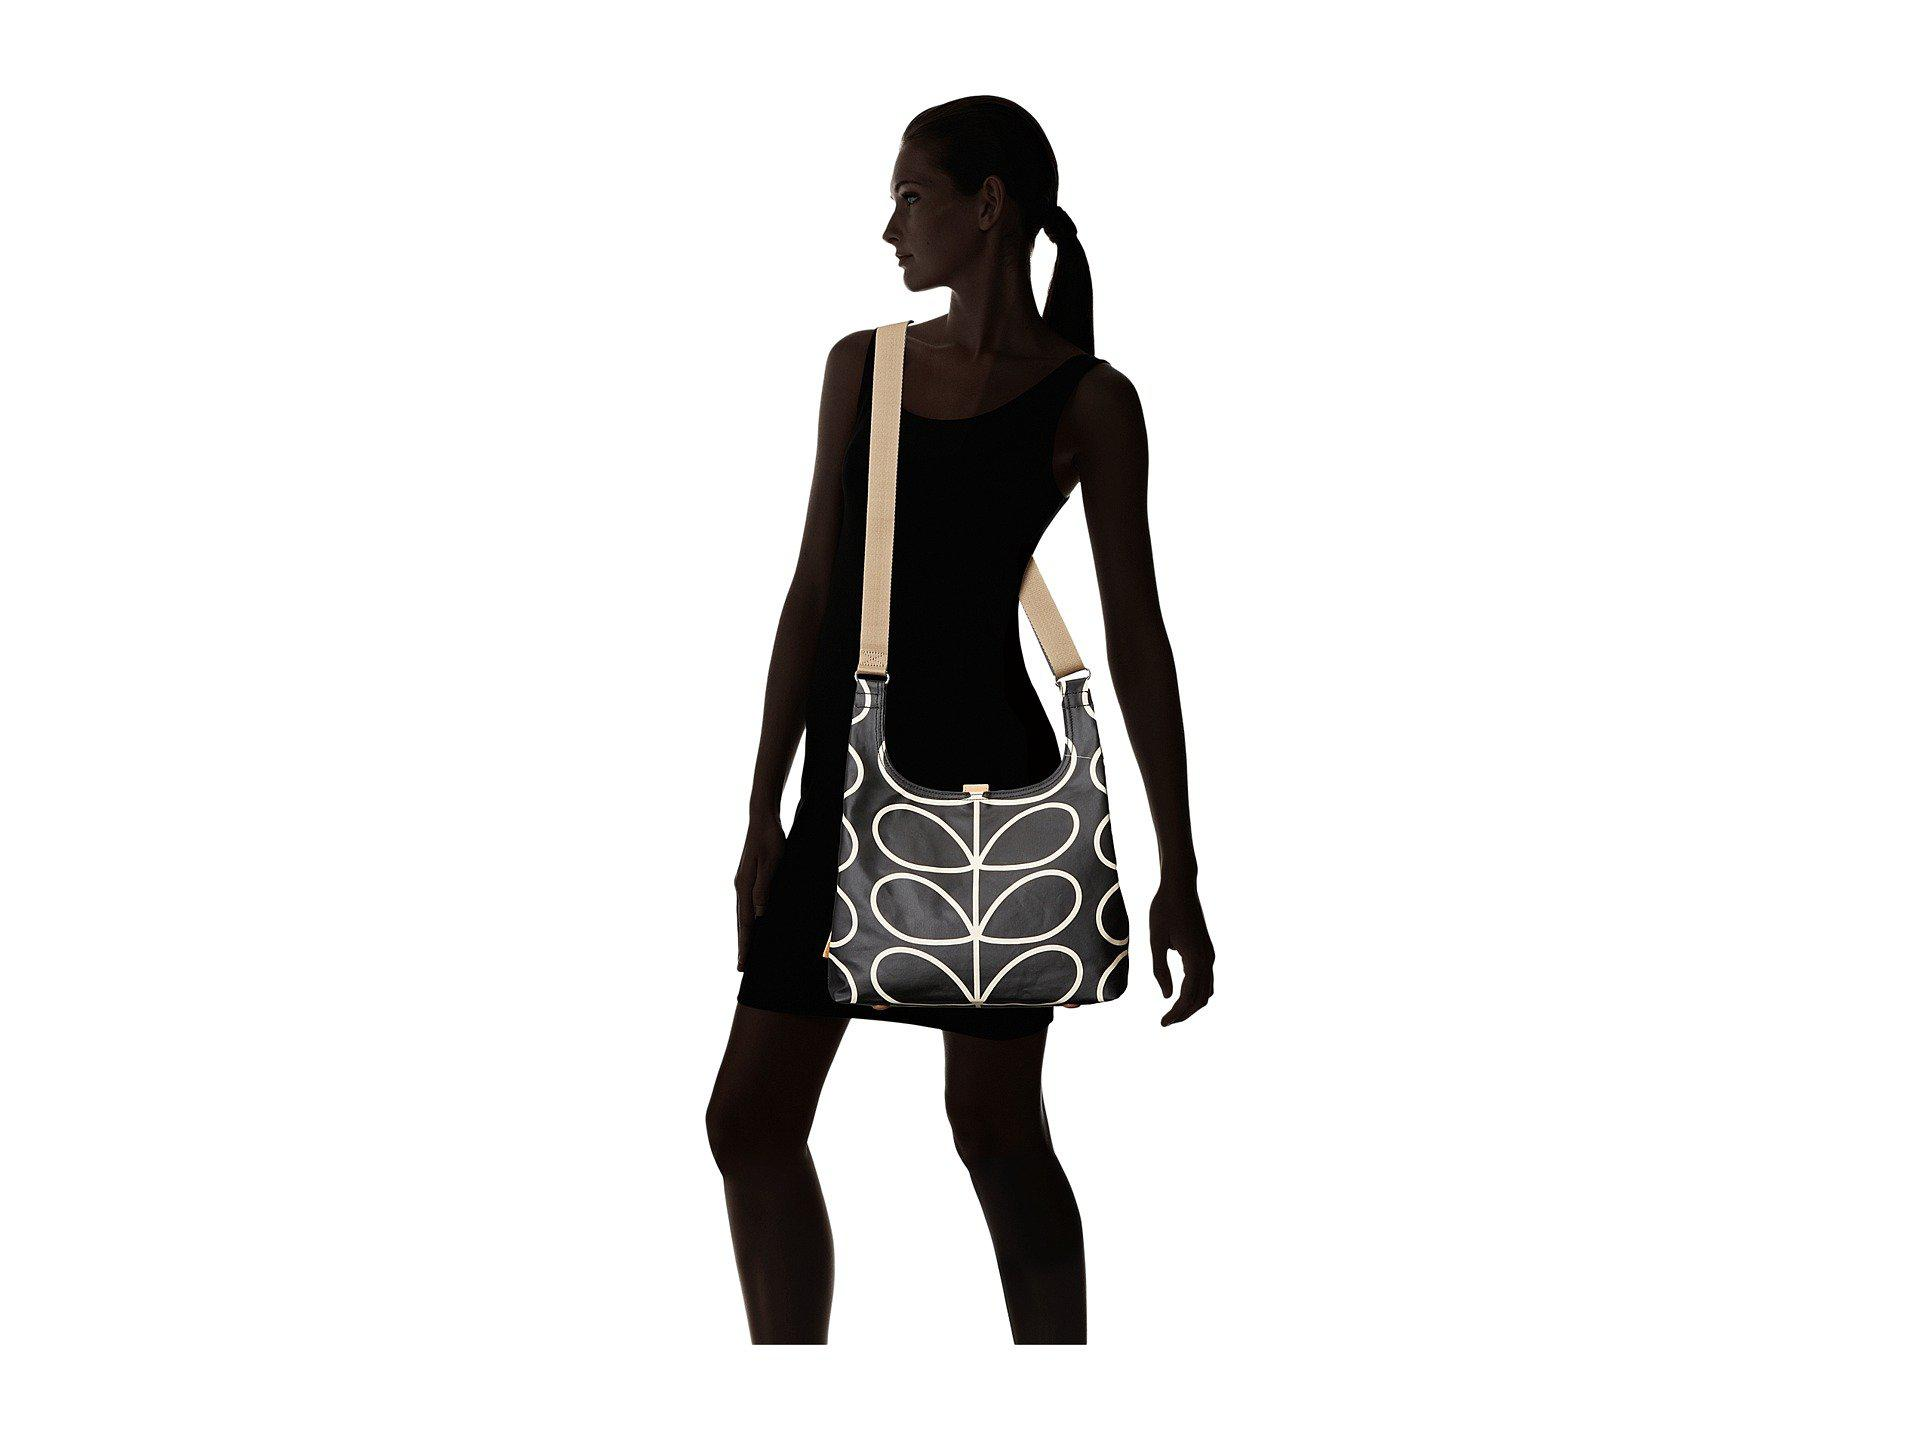 468c35f28d1fd Lyst - Orla Kiely Midi Sling Bag in Black